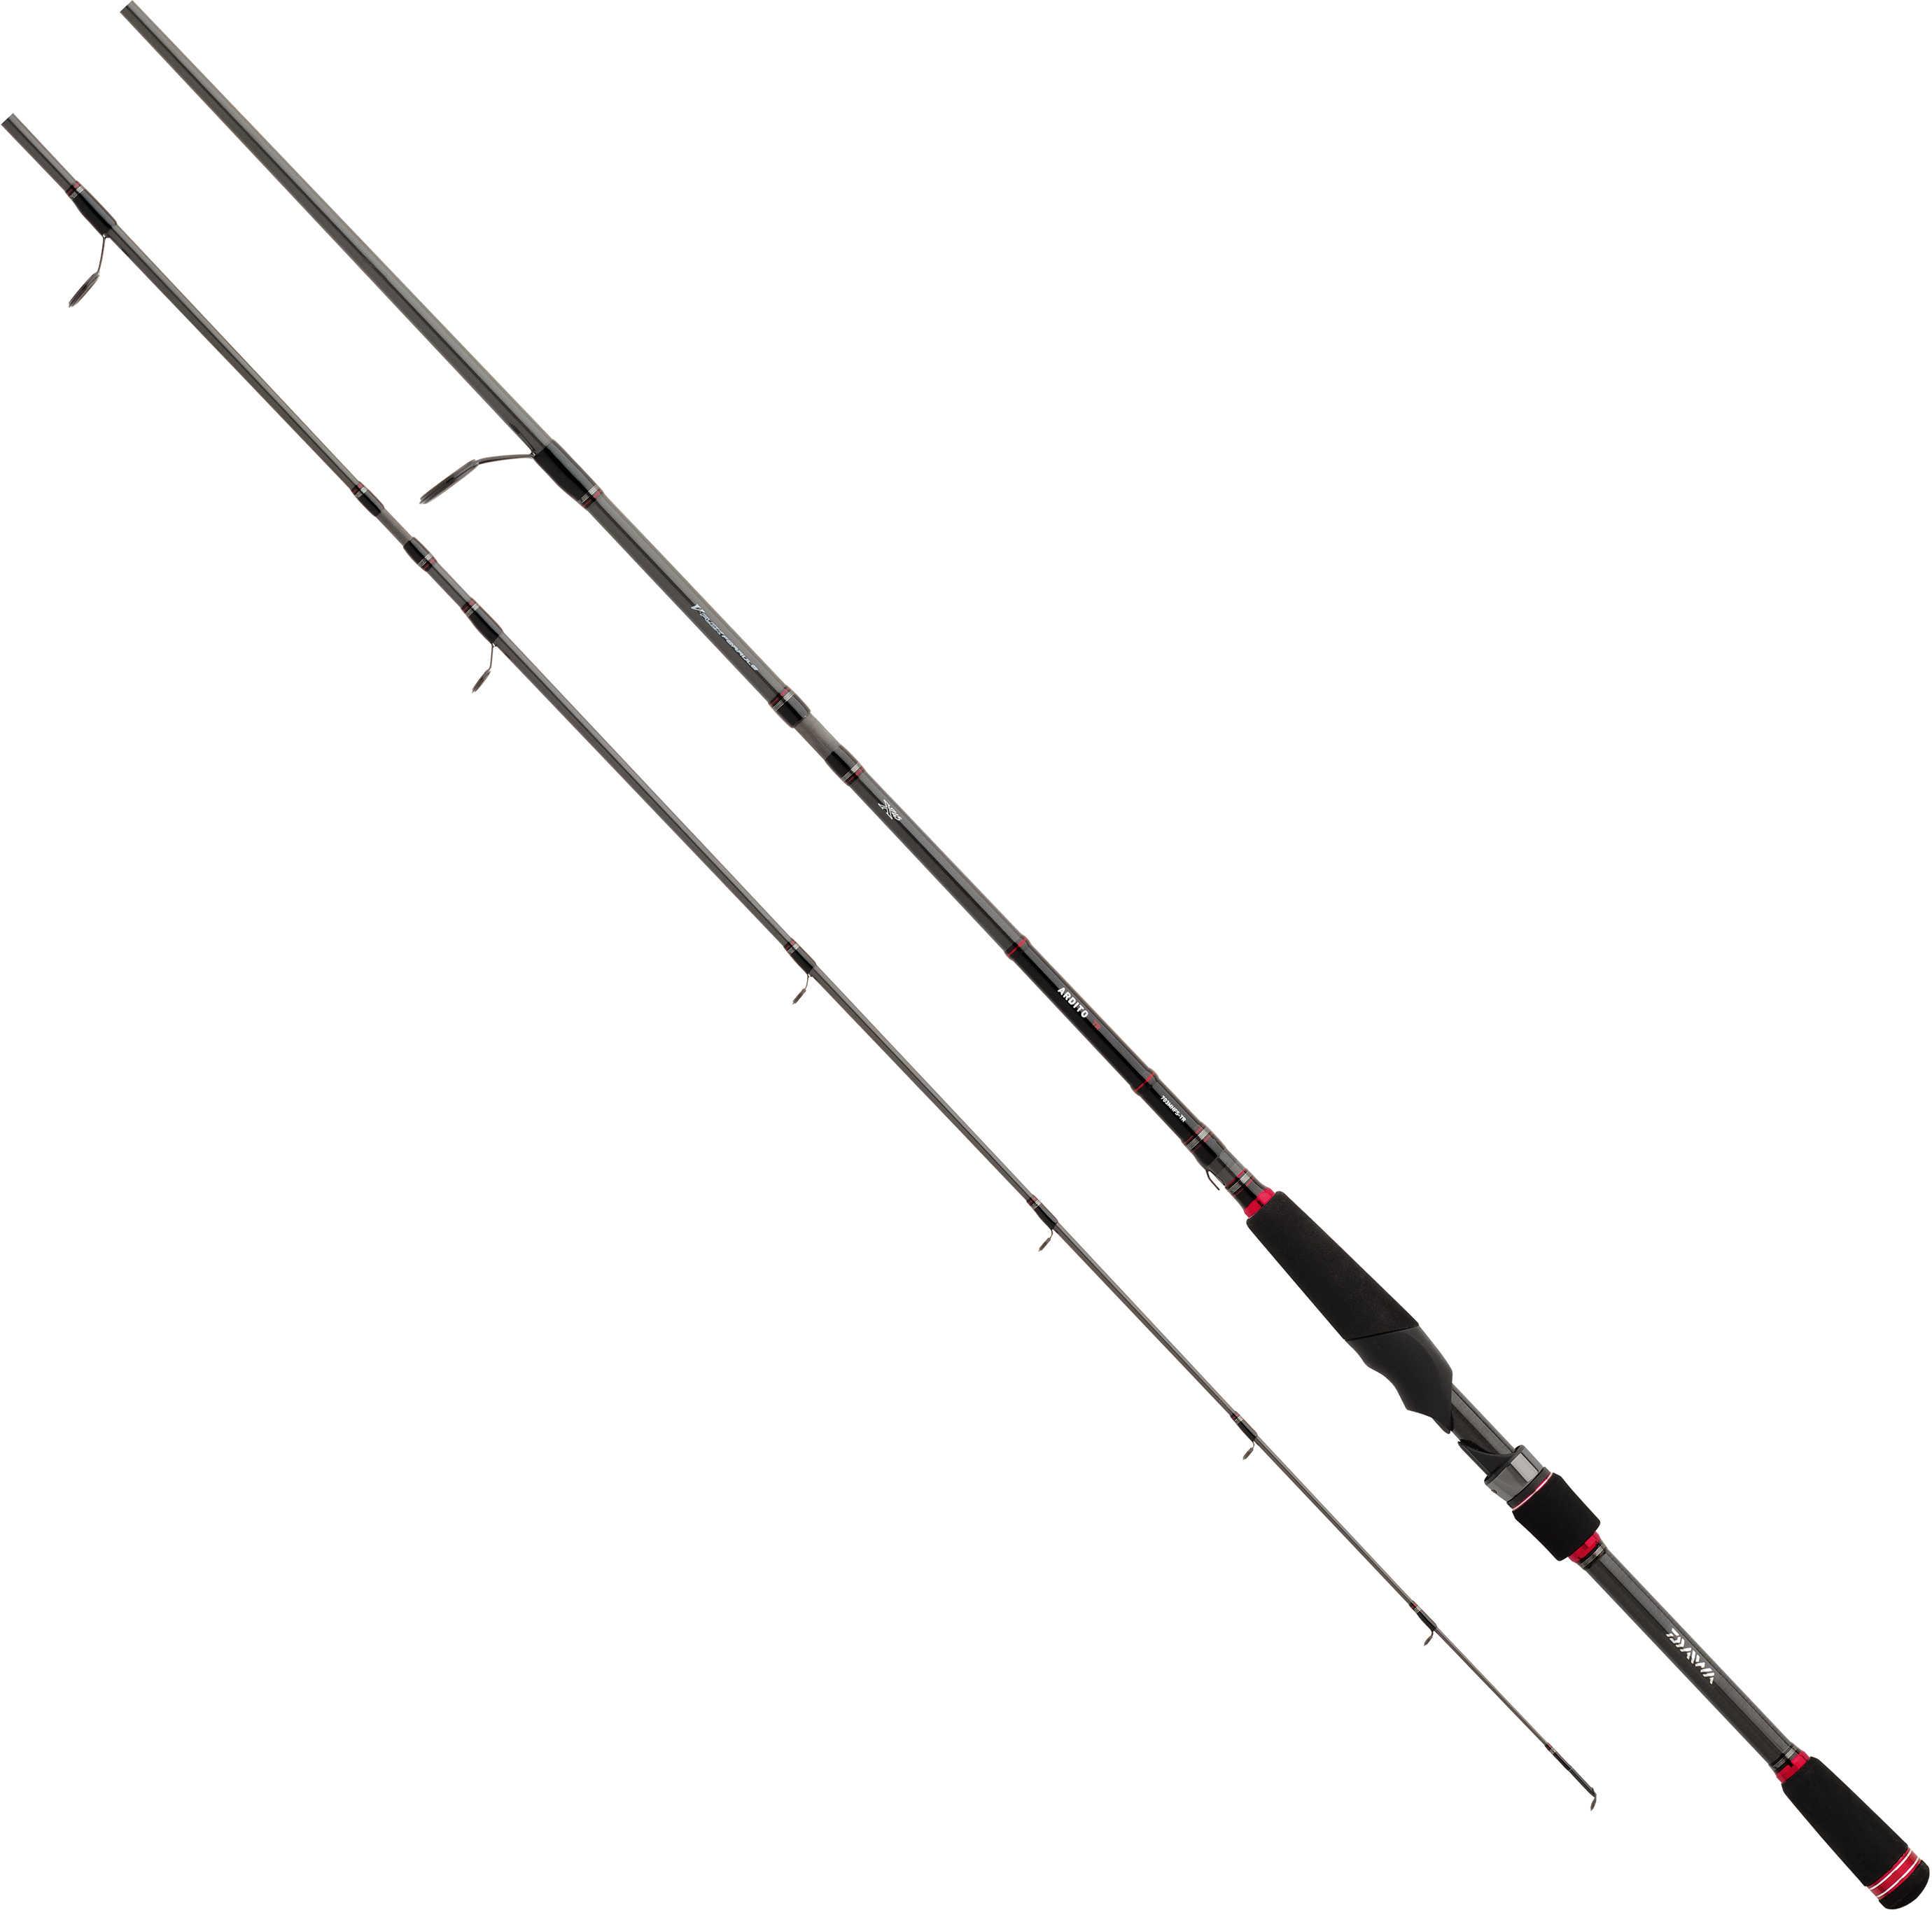 "Daiwa Ardito-TR Multi Piece Travel Spinning Rod 7'6"" Length, 3 Piece Rod, Medium/Heavy Power, Fast Action"